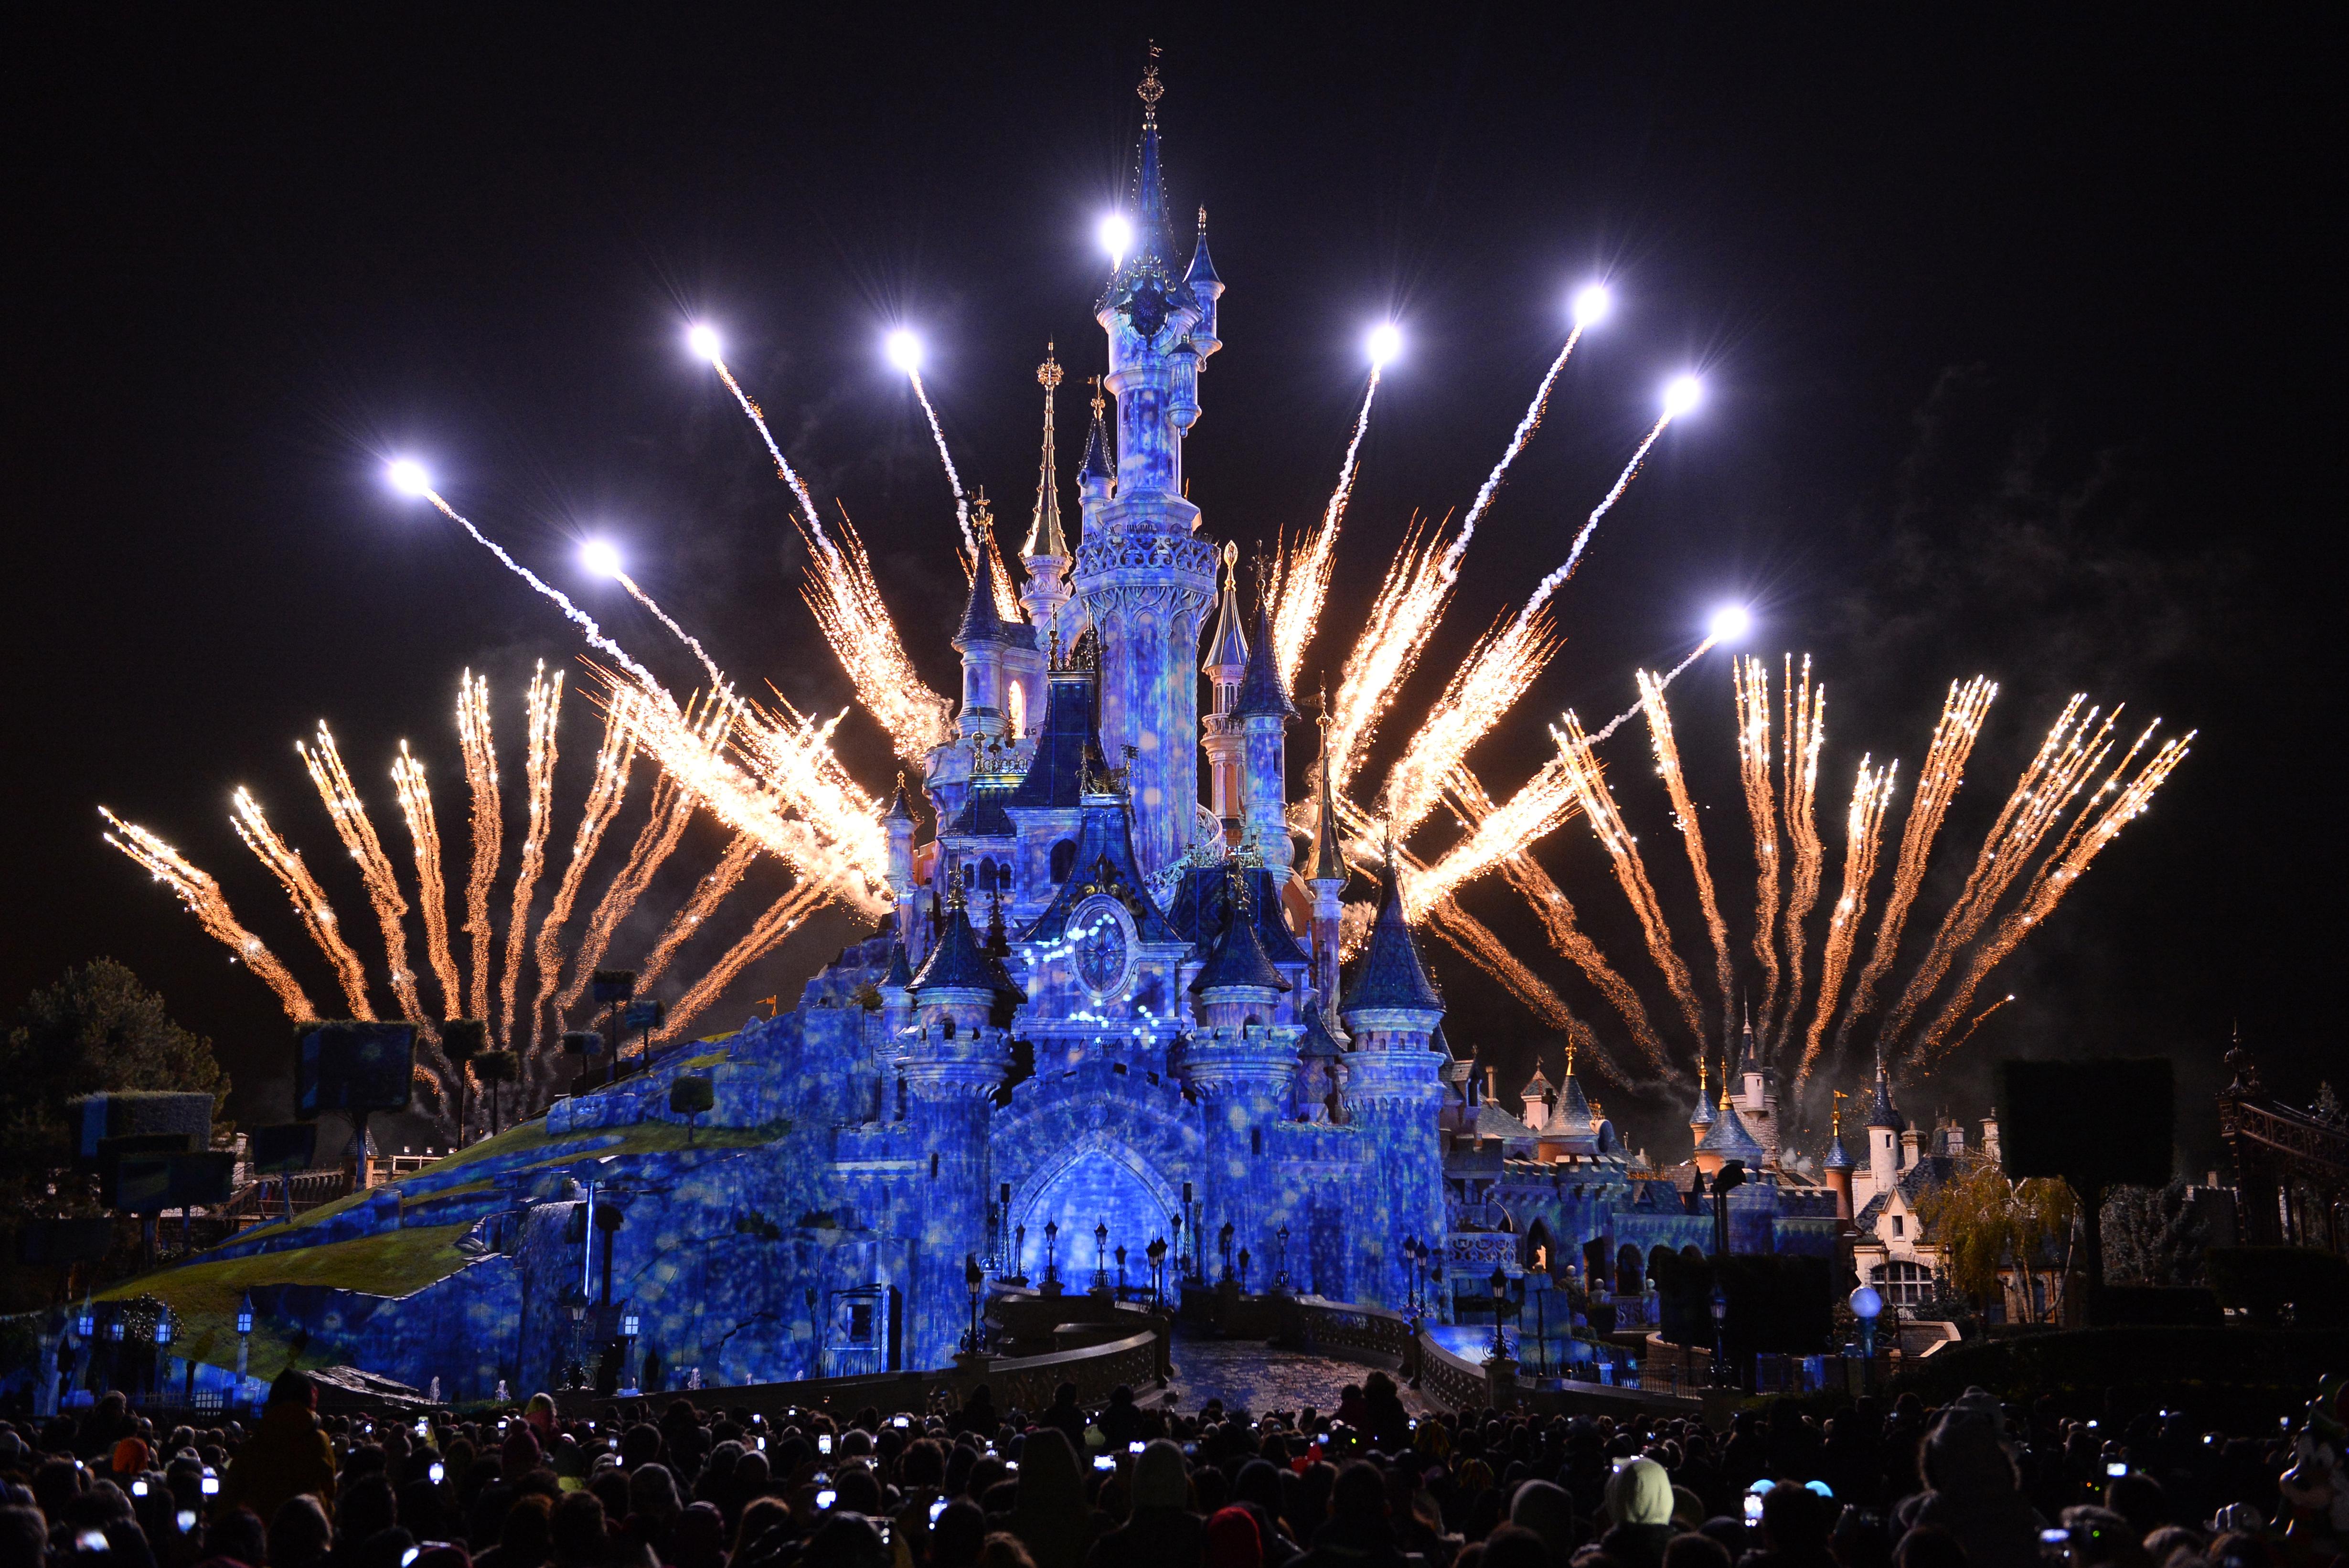 Fireworks at Disneyland Paris New Years Eve